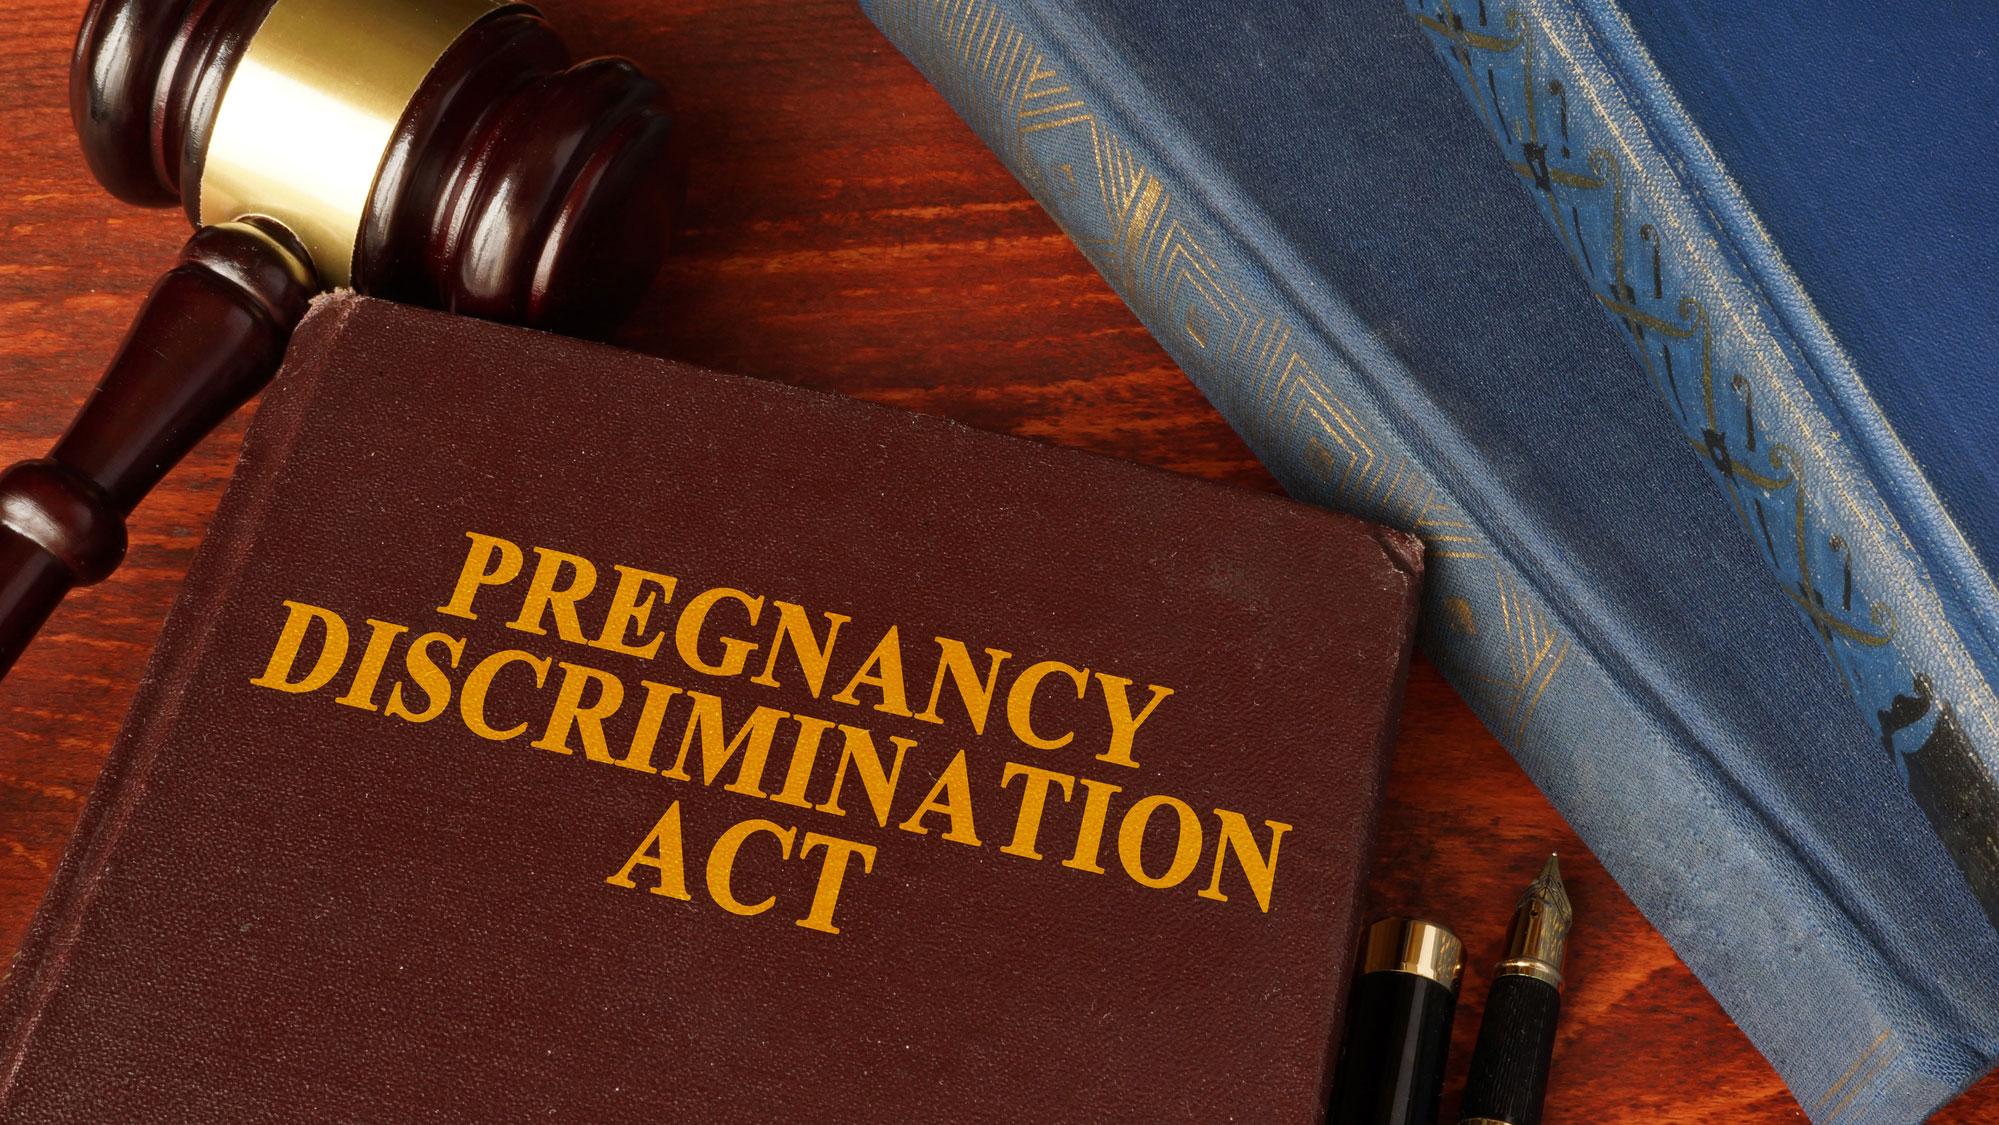 pregnancy discrimination act